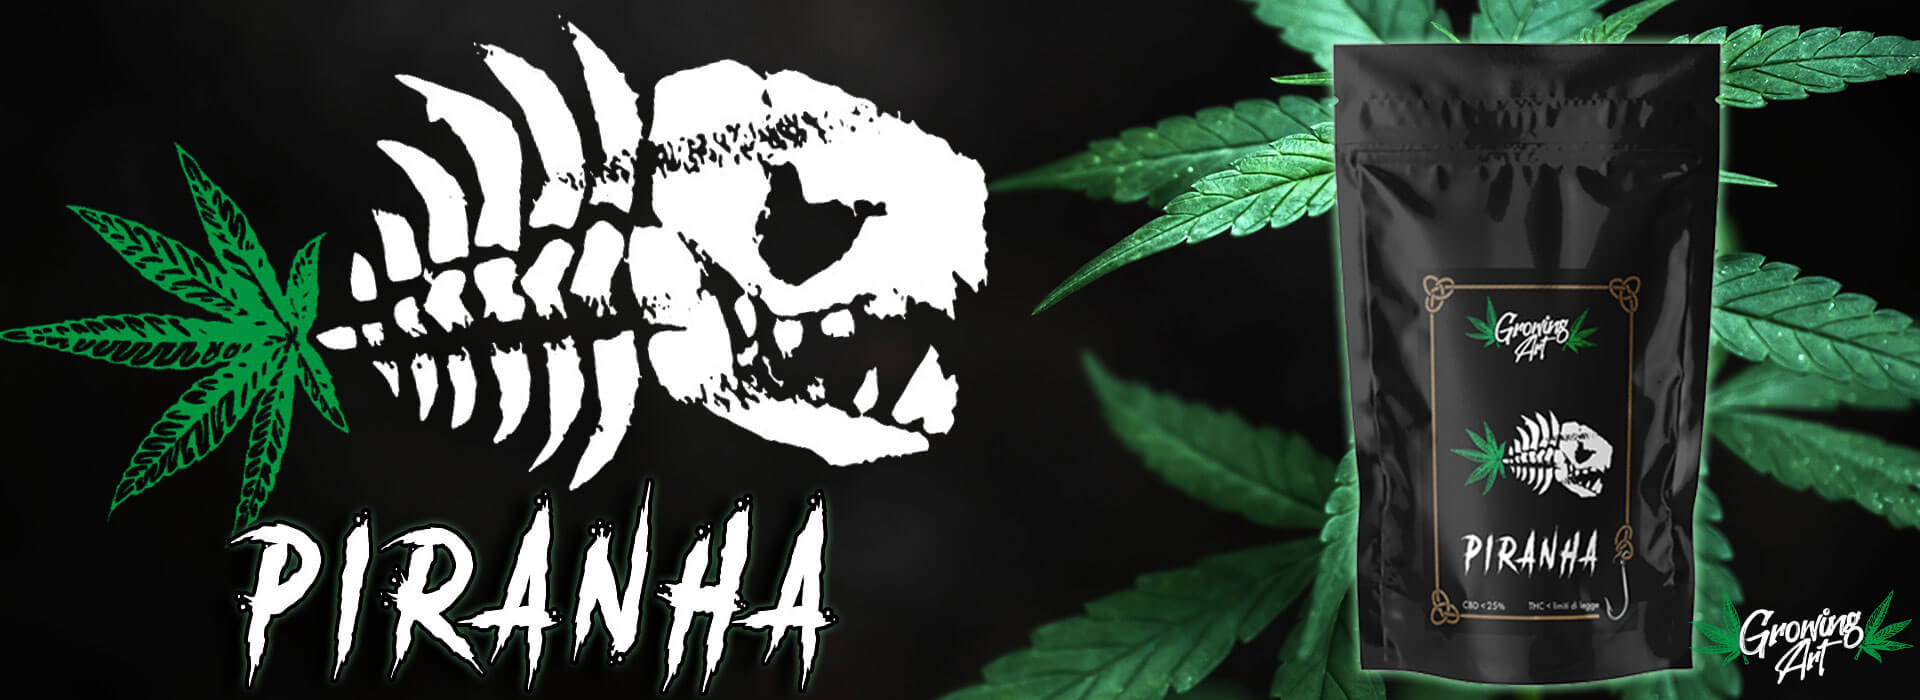 Shop cannabis legale – Infiorescenze canapa light CBD Growing Art Piranha - Slider